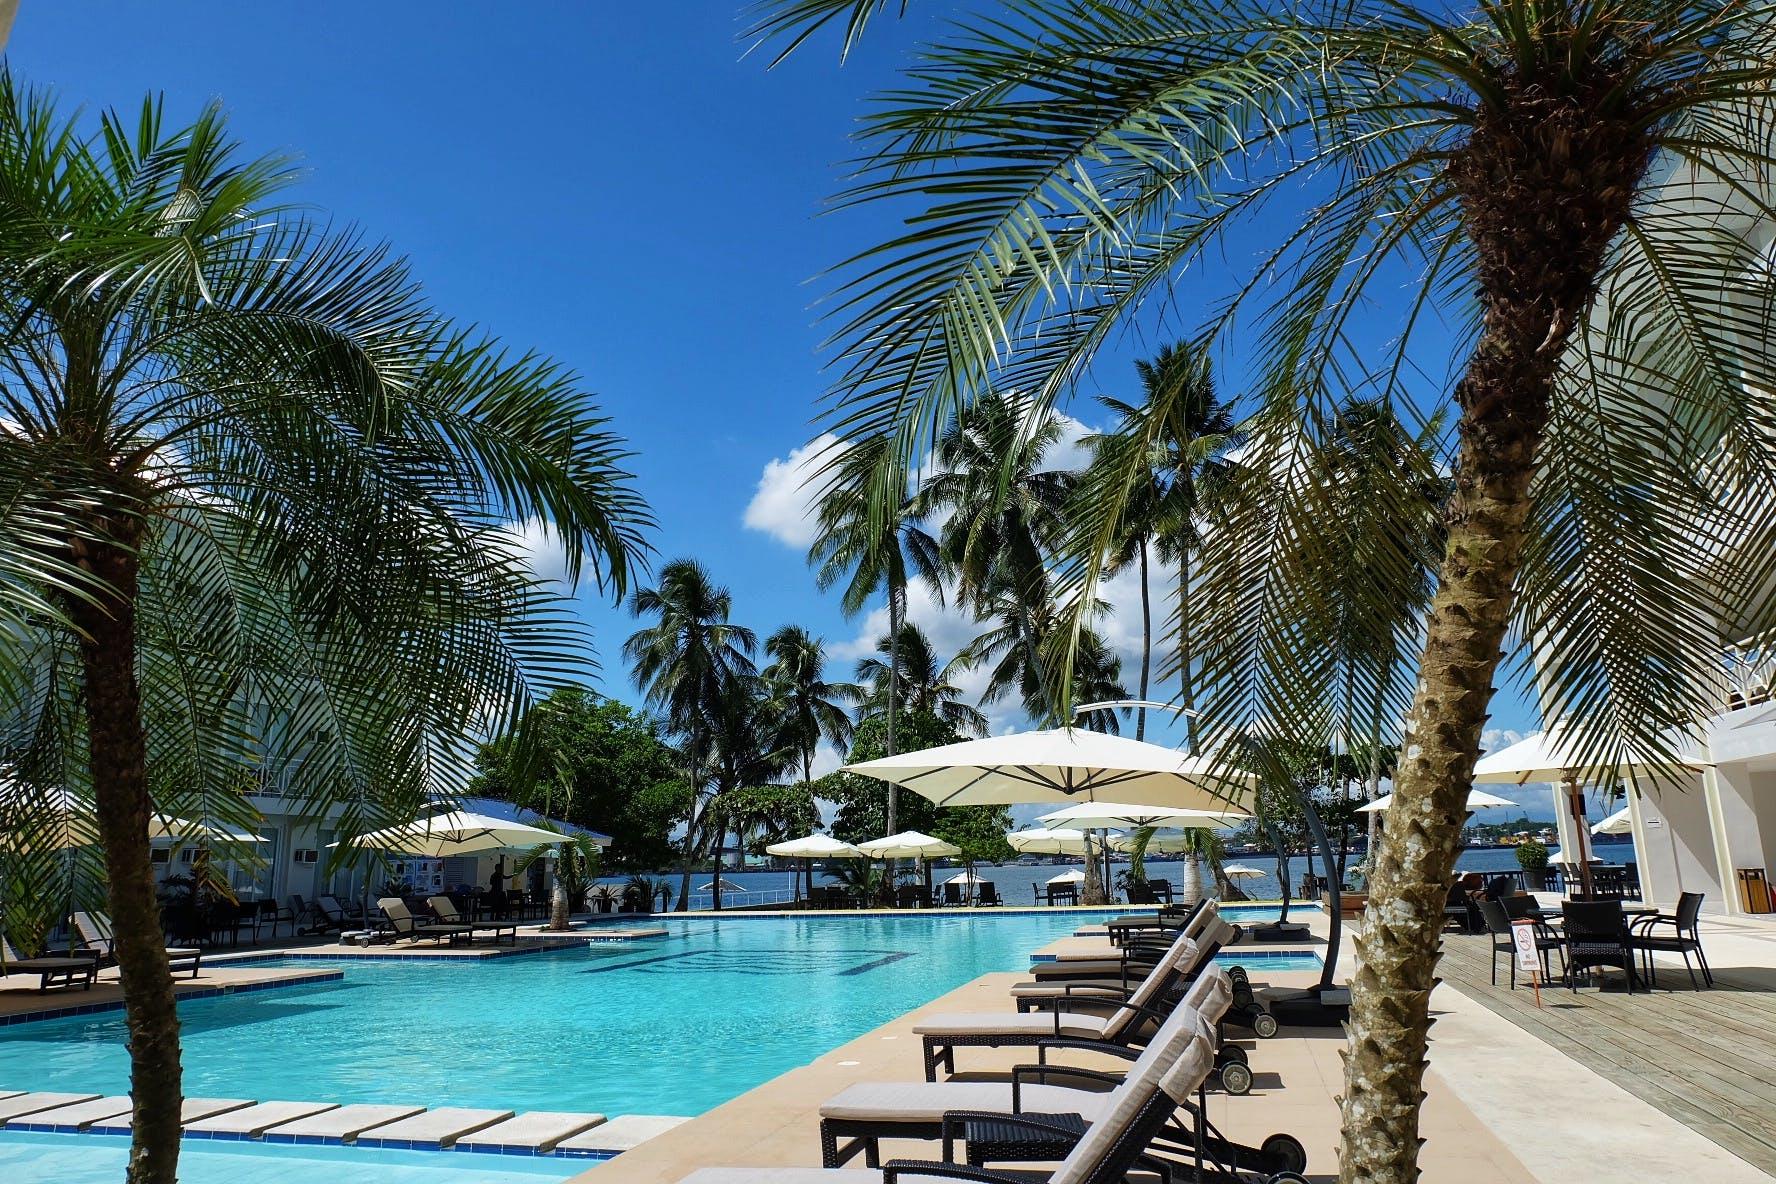 Free stock photo of beach resort, coconut trees, Philippines